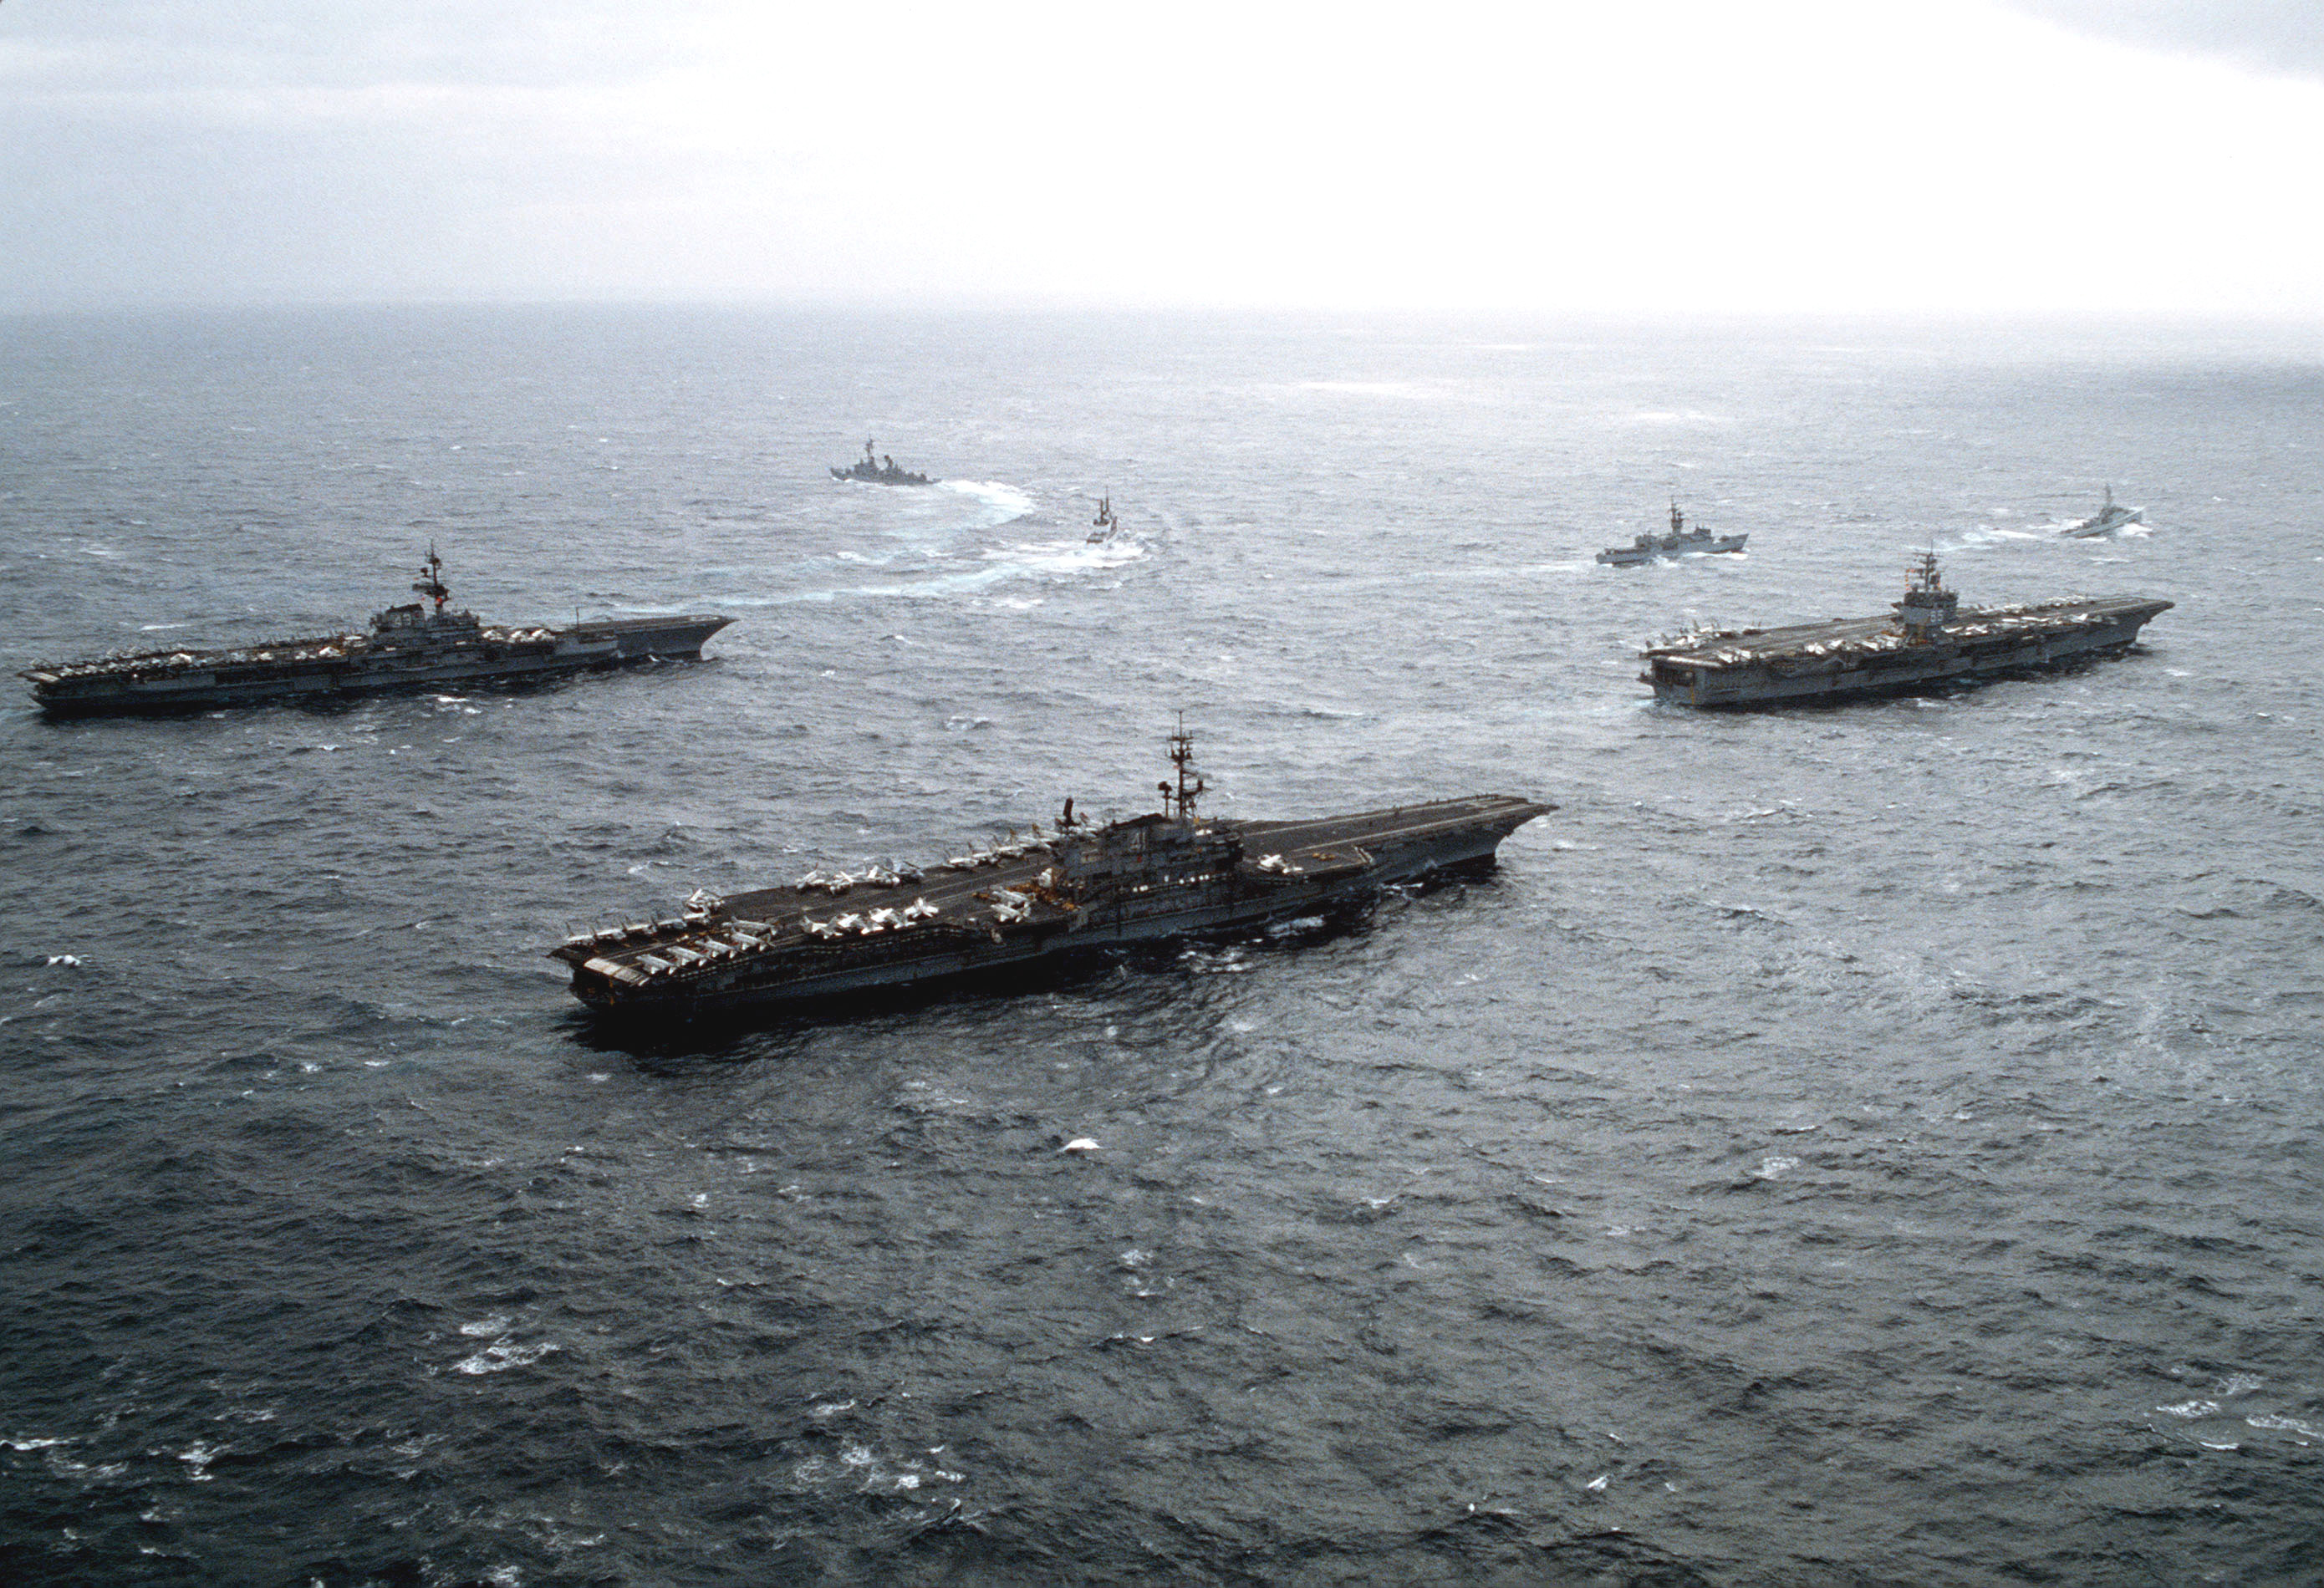 Enterprise Cv Uss 41 Coral Cv Midway Uss Uss 65 Sea 43 Cv